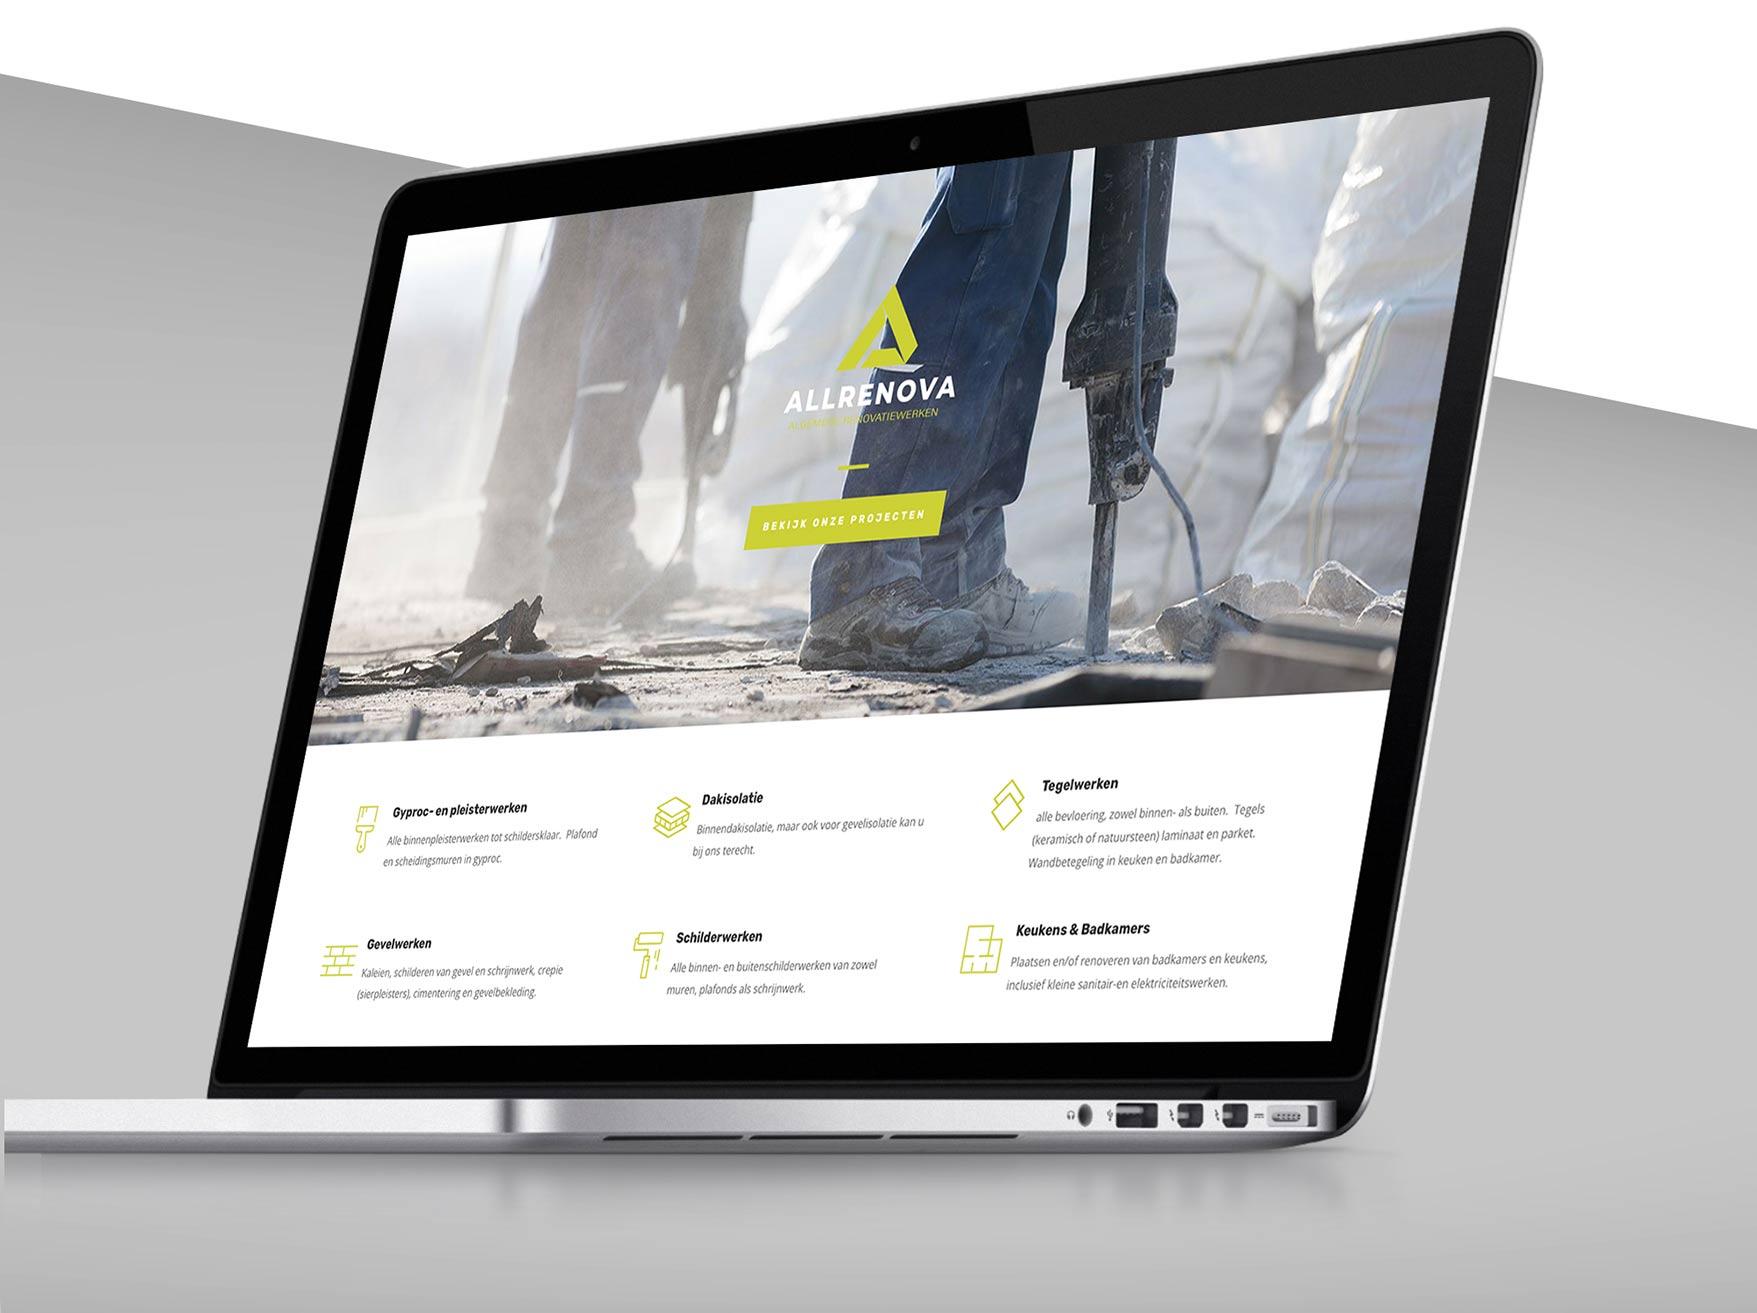 mark-up-gent-webdesign-allrenova-macbookpro